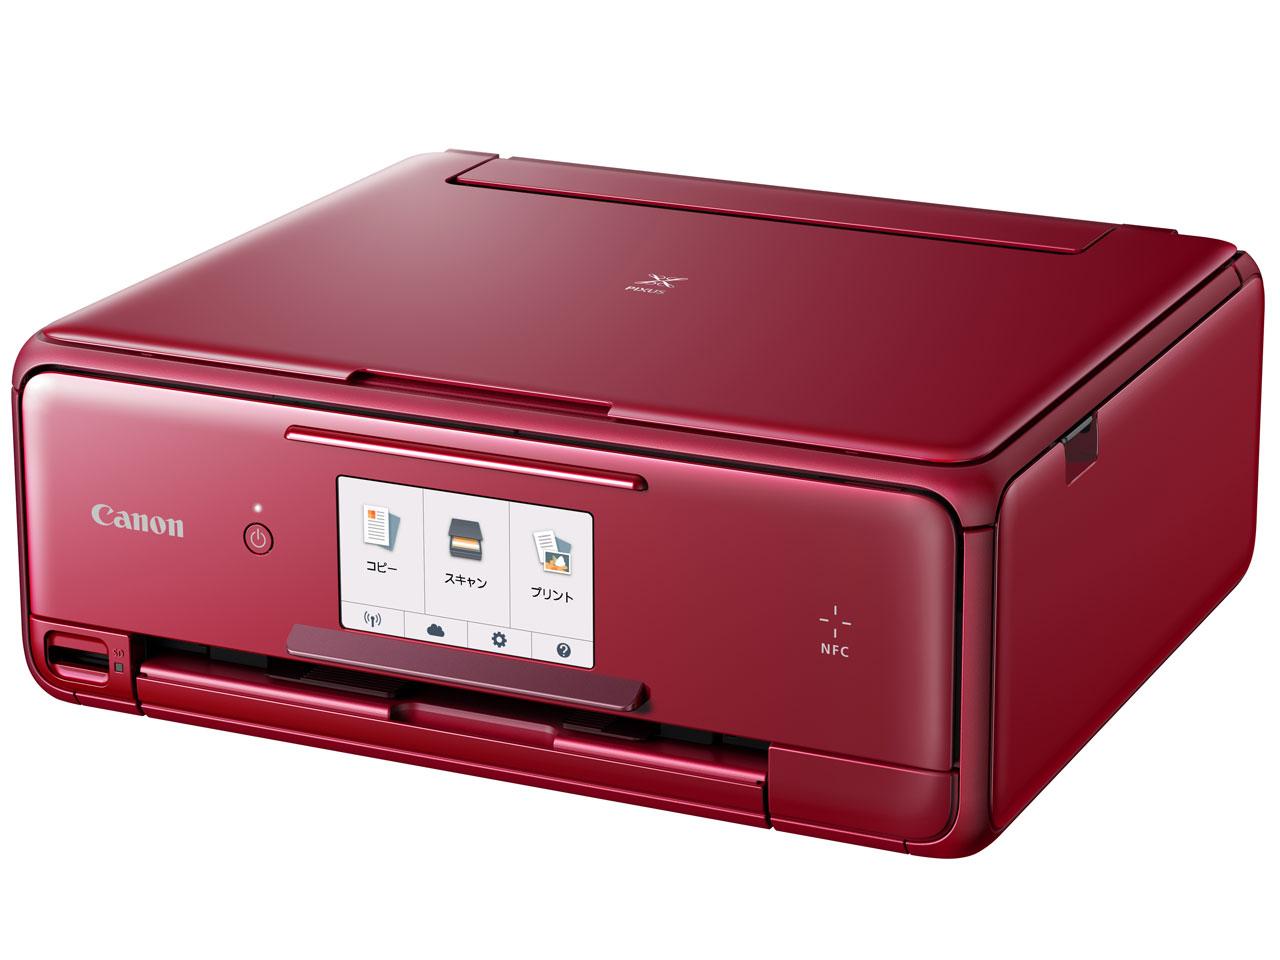 PIXUS TS8030 [レッド] の製品画像